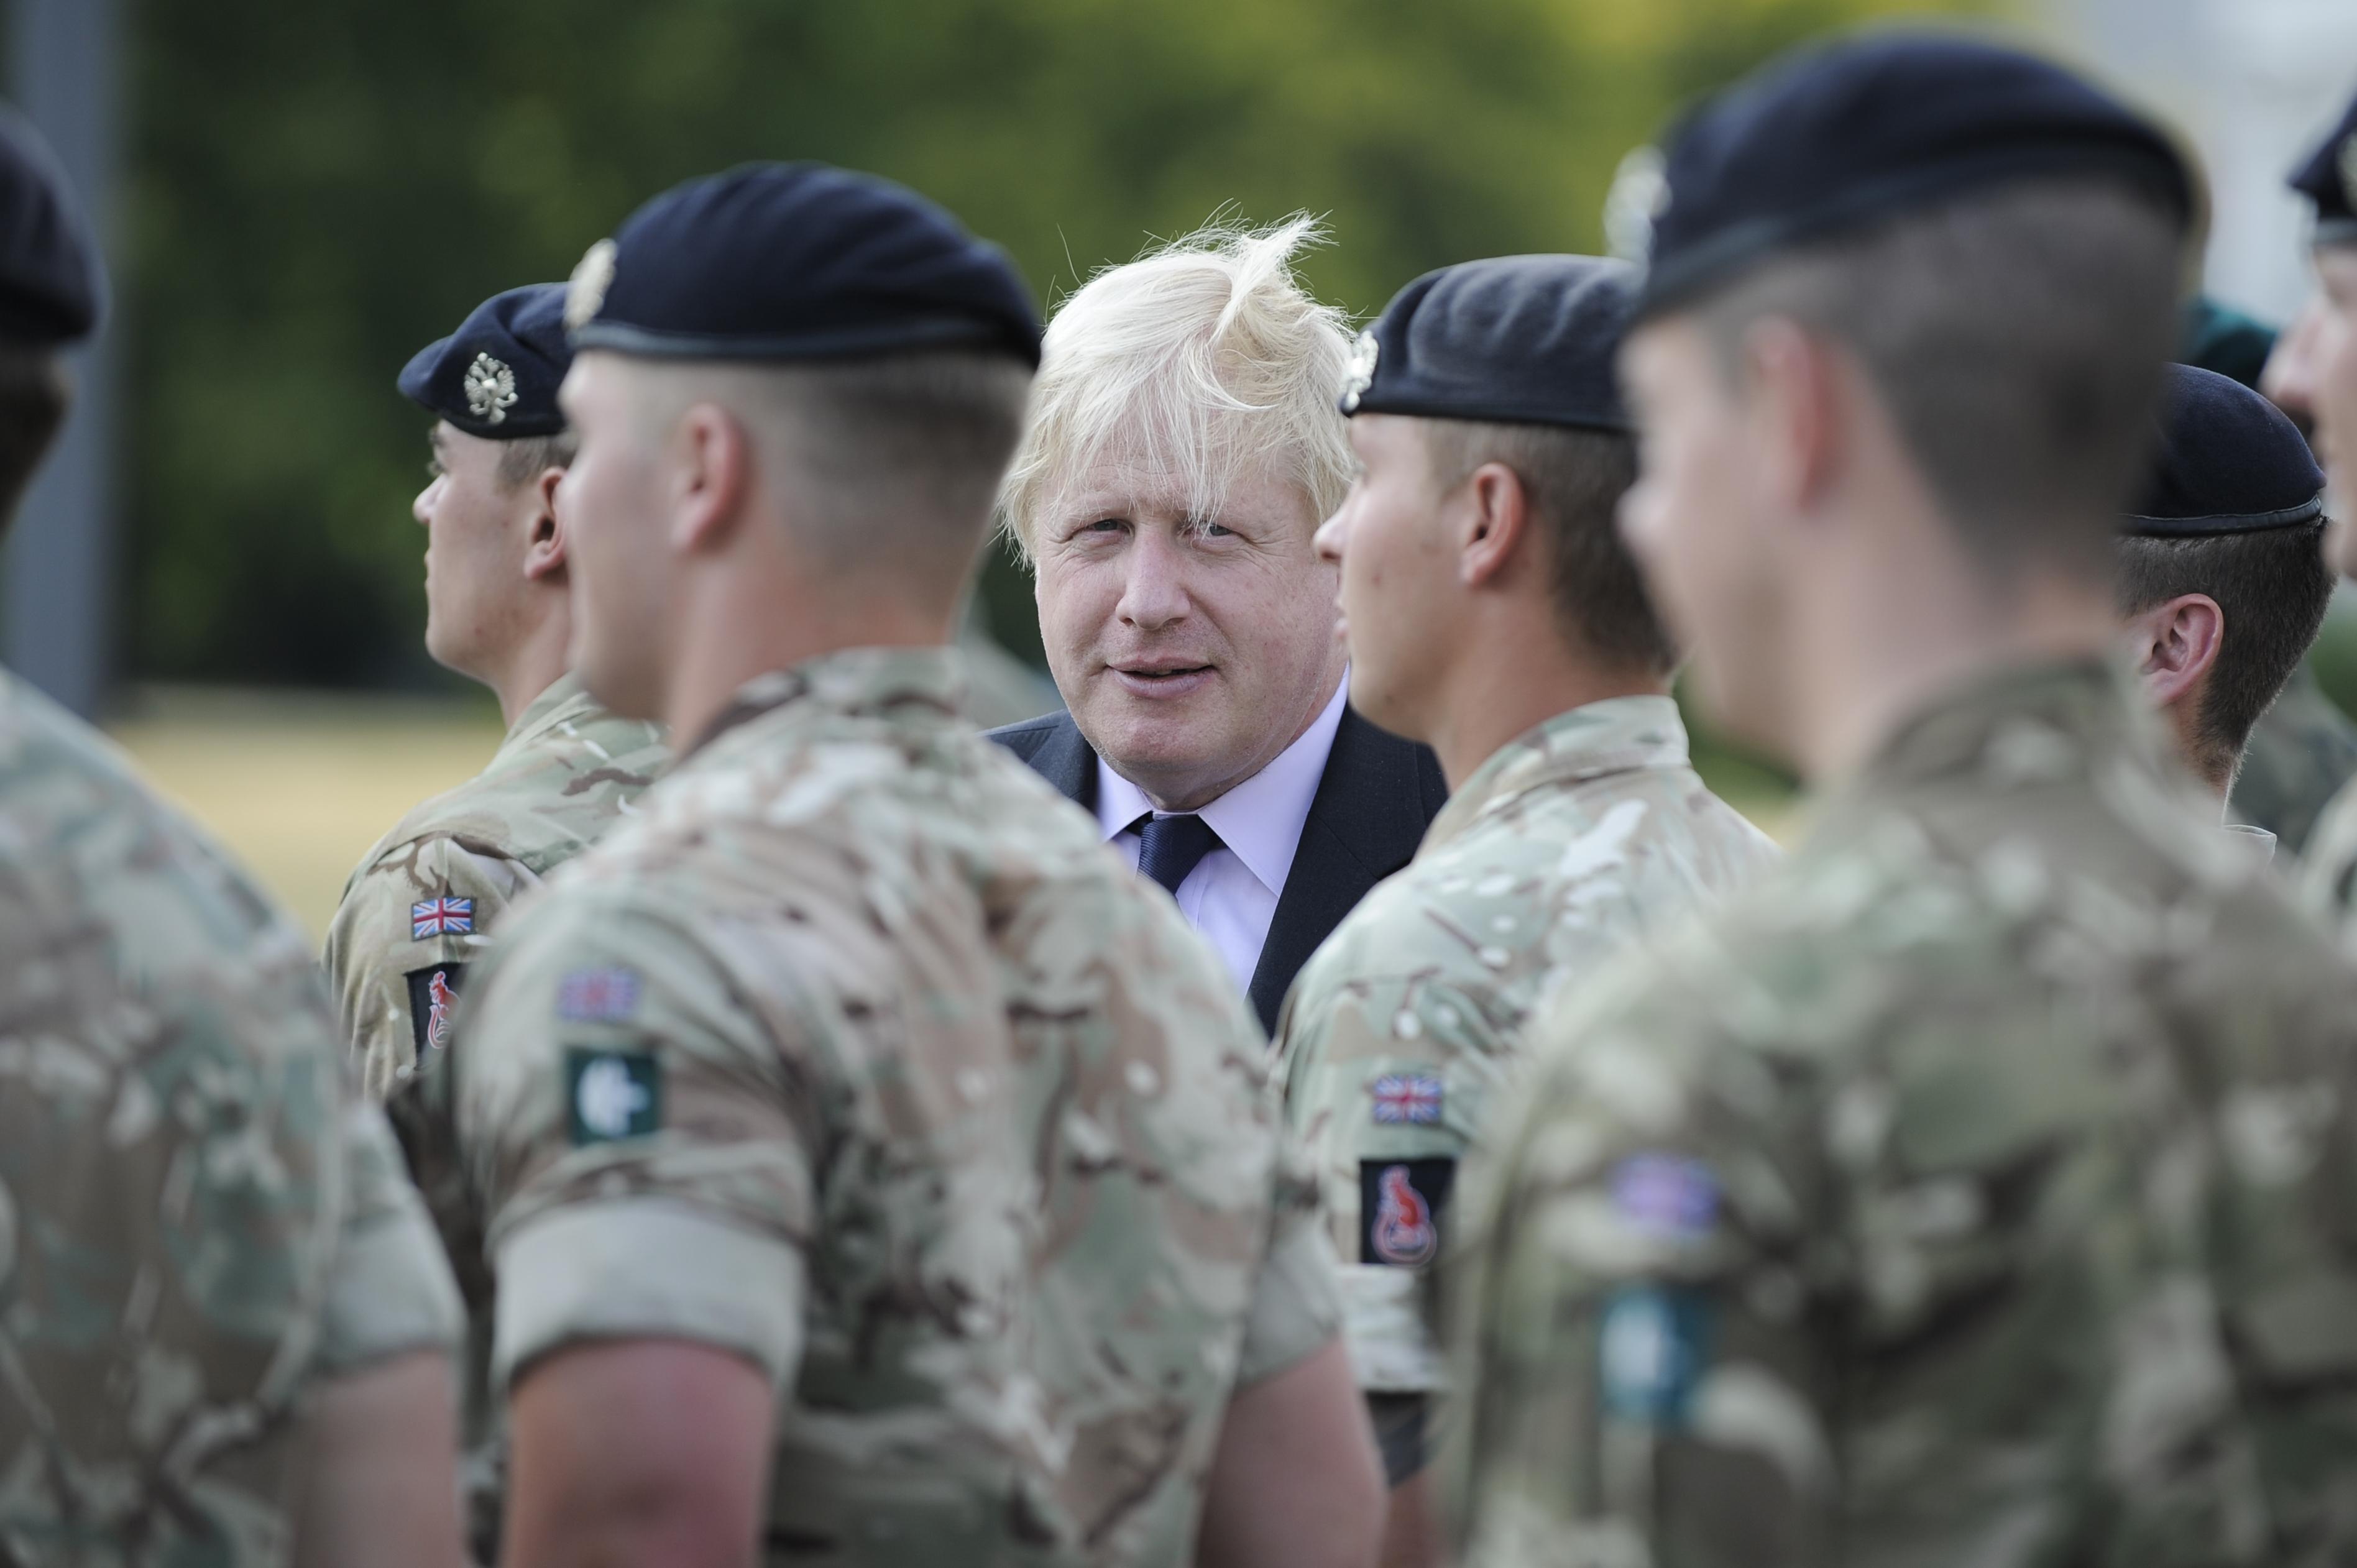 The Foreign Secretary Boris Johnson and Defense Secretary Gavin Williamson visit Warsaw, Poland on June 21, 2018 to meet with Polish minister of defense Mariusz Blasczak and Minister of Foreign Affairs Jacek Czaputowicz. (Photo by Jaap Arriens / Sipa USA)